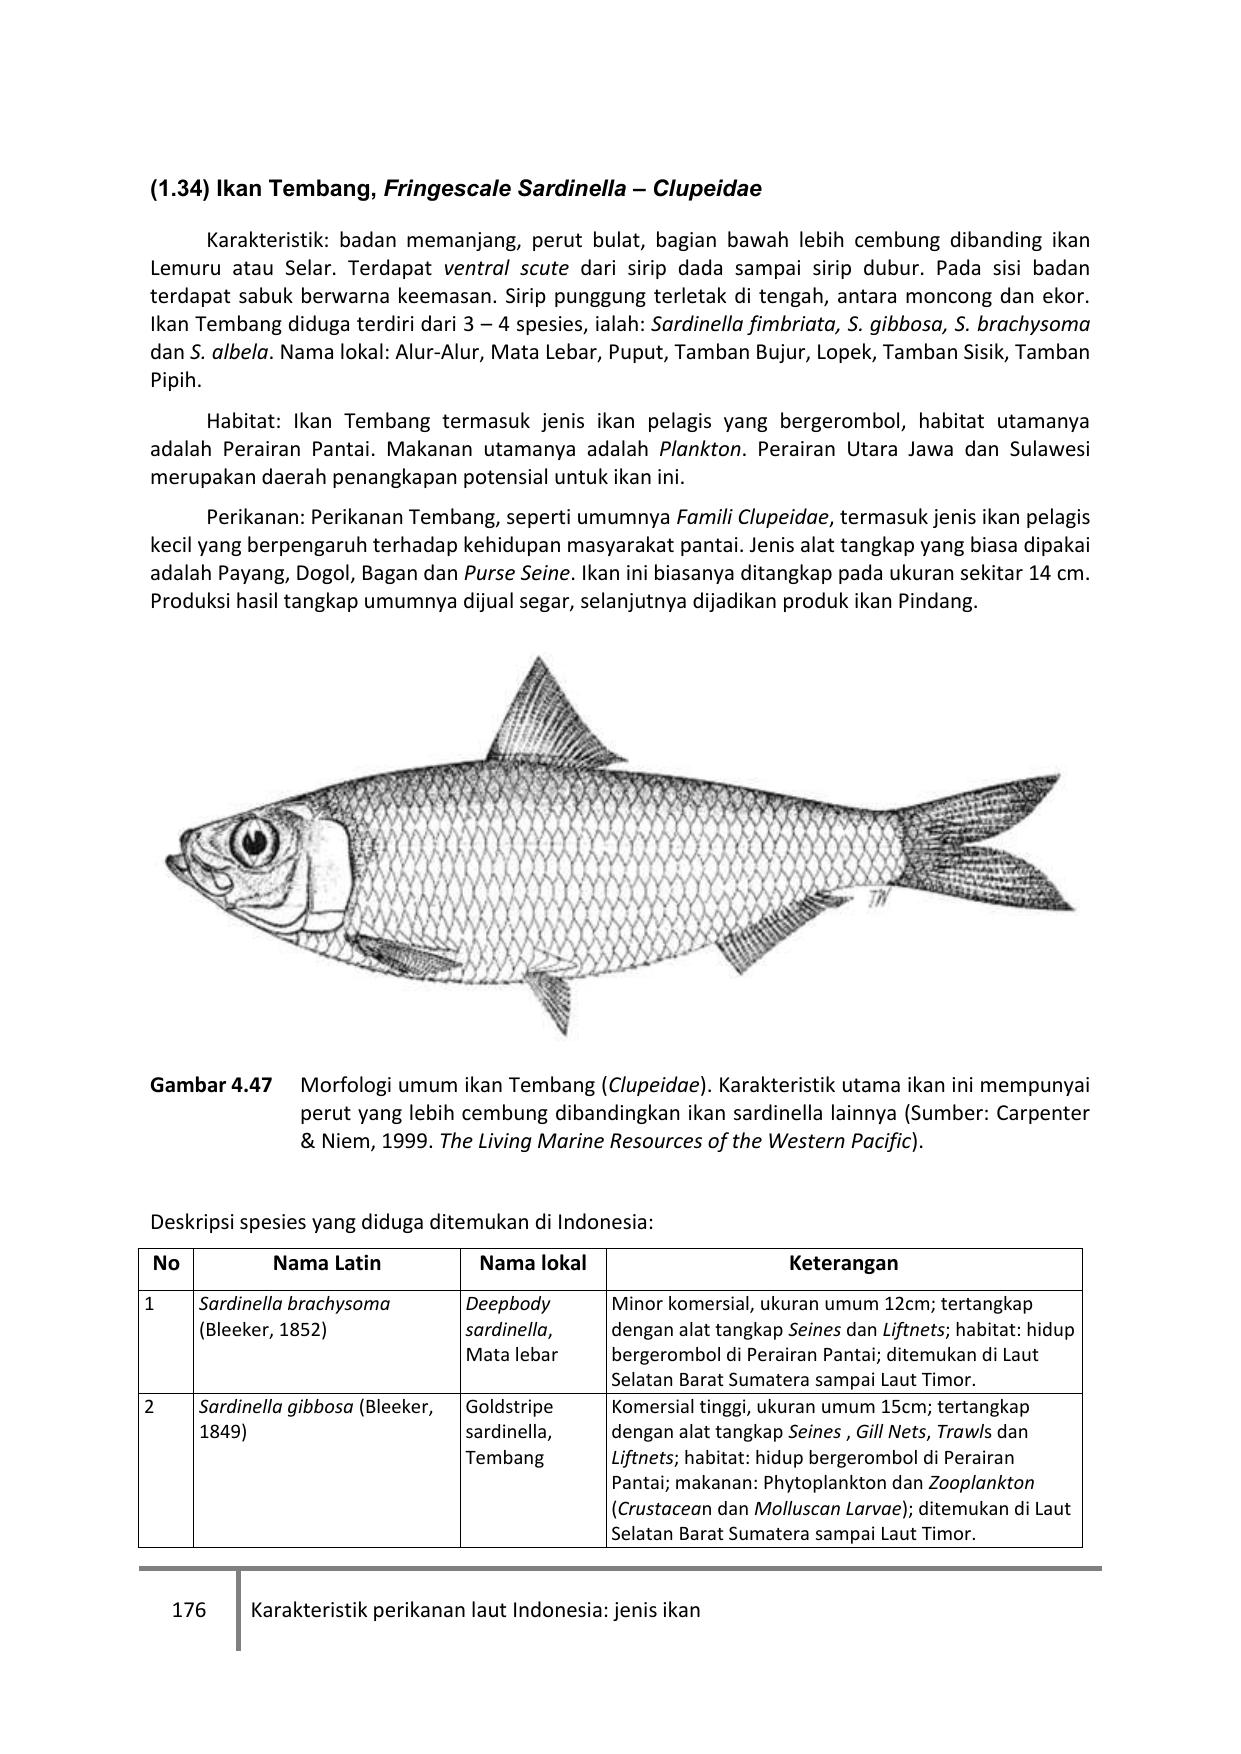 176 Karakteristik Perikanan Laut Indonesia Jenis Ikan 1 34 Ikan